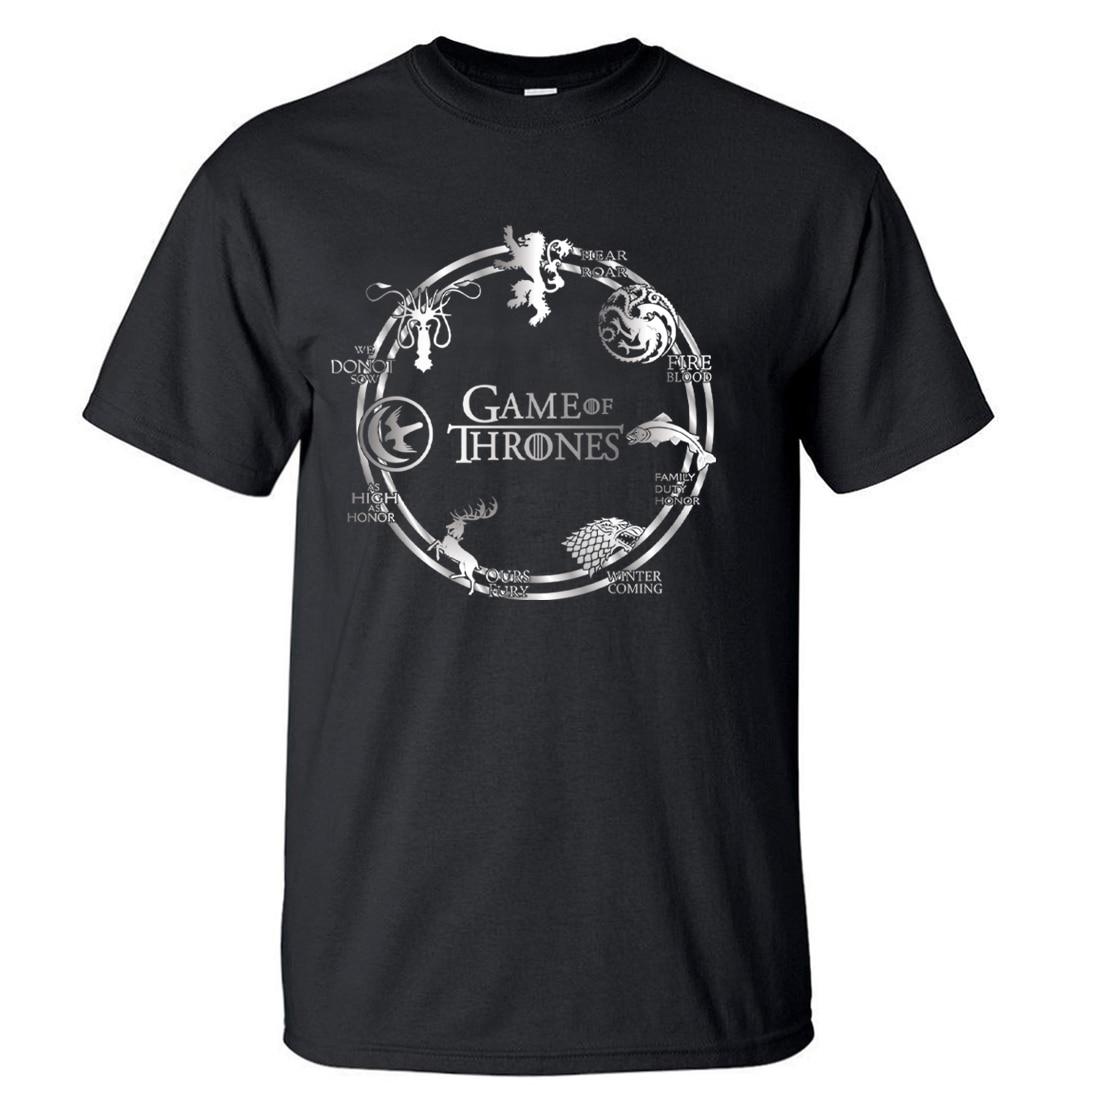 Hot Sale Game of Thrones Men   T  -  Shirts   2018 Summer Casual Fashion Men   T     Shirts   100% Cotton High Quality Short Sleeve Men   T  -  Shirts